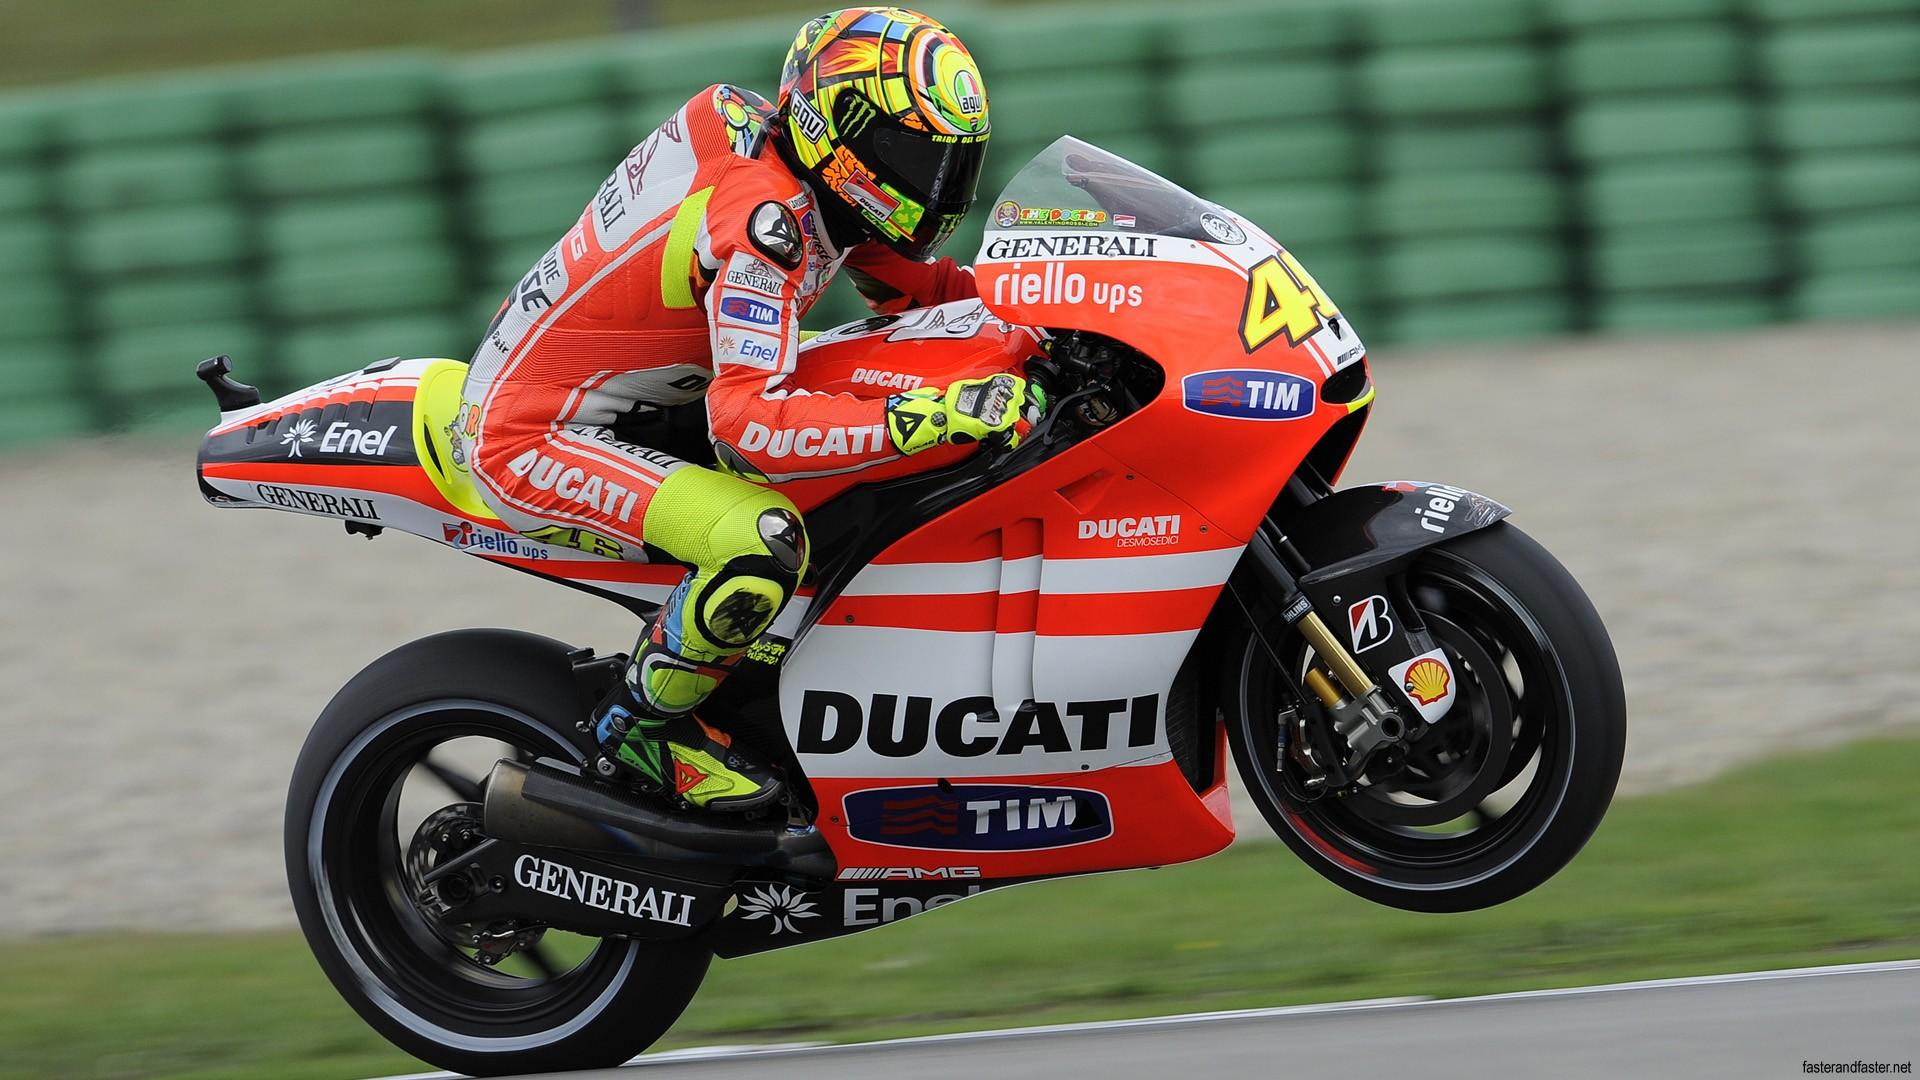 Bikes_Ducati_Ducati_Sportbike_Wheelie_Motion_Blur_Valentino_Rossi_34865.jpg